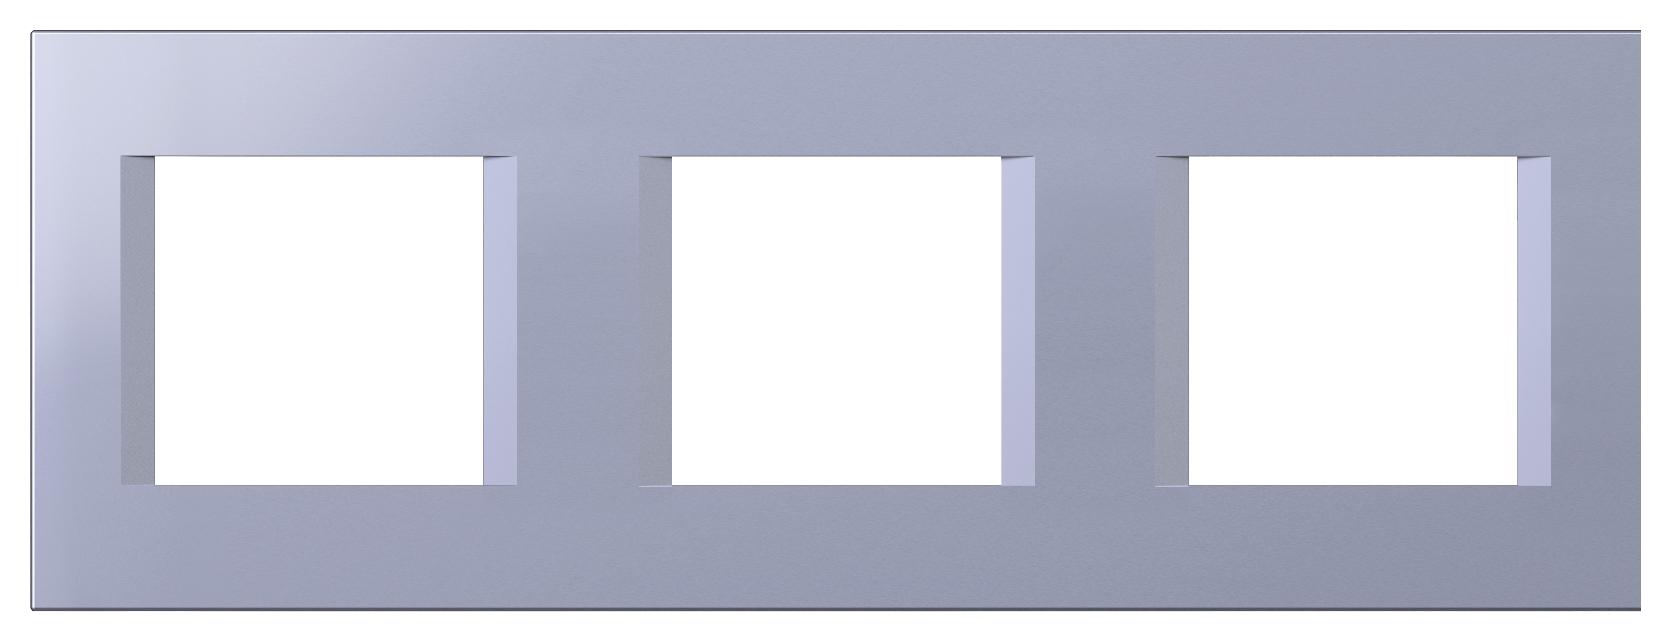 1 Stk Rahmen 3x2M, impulse blau ET145020IB